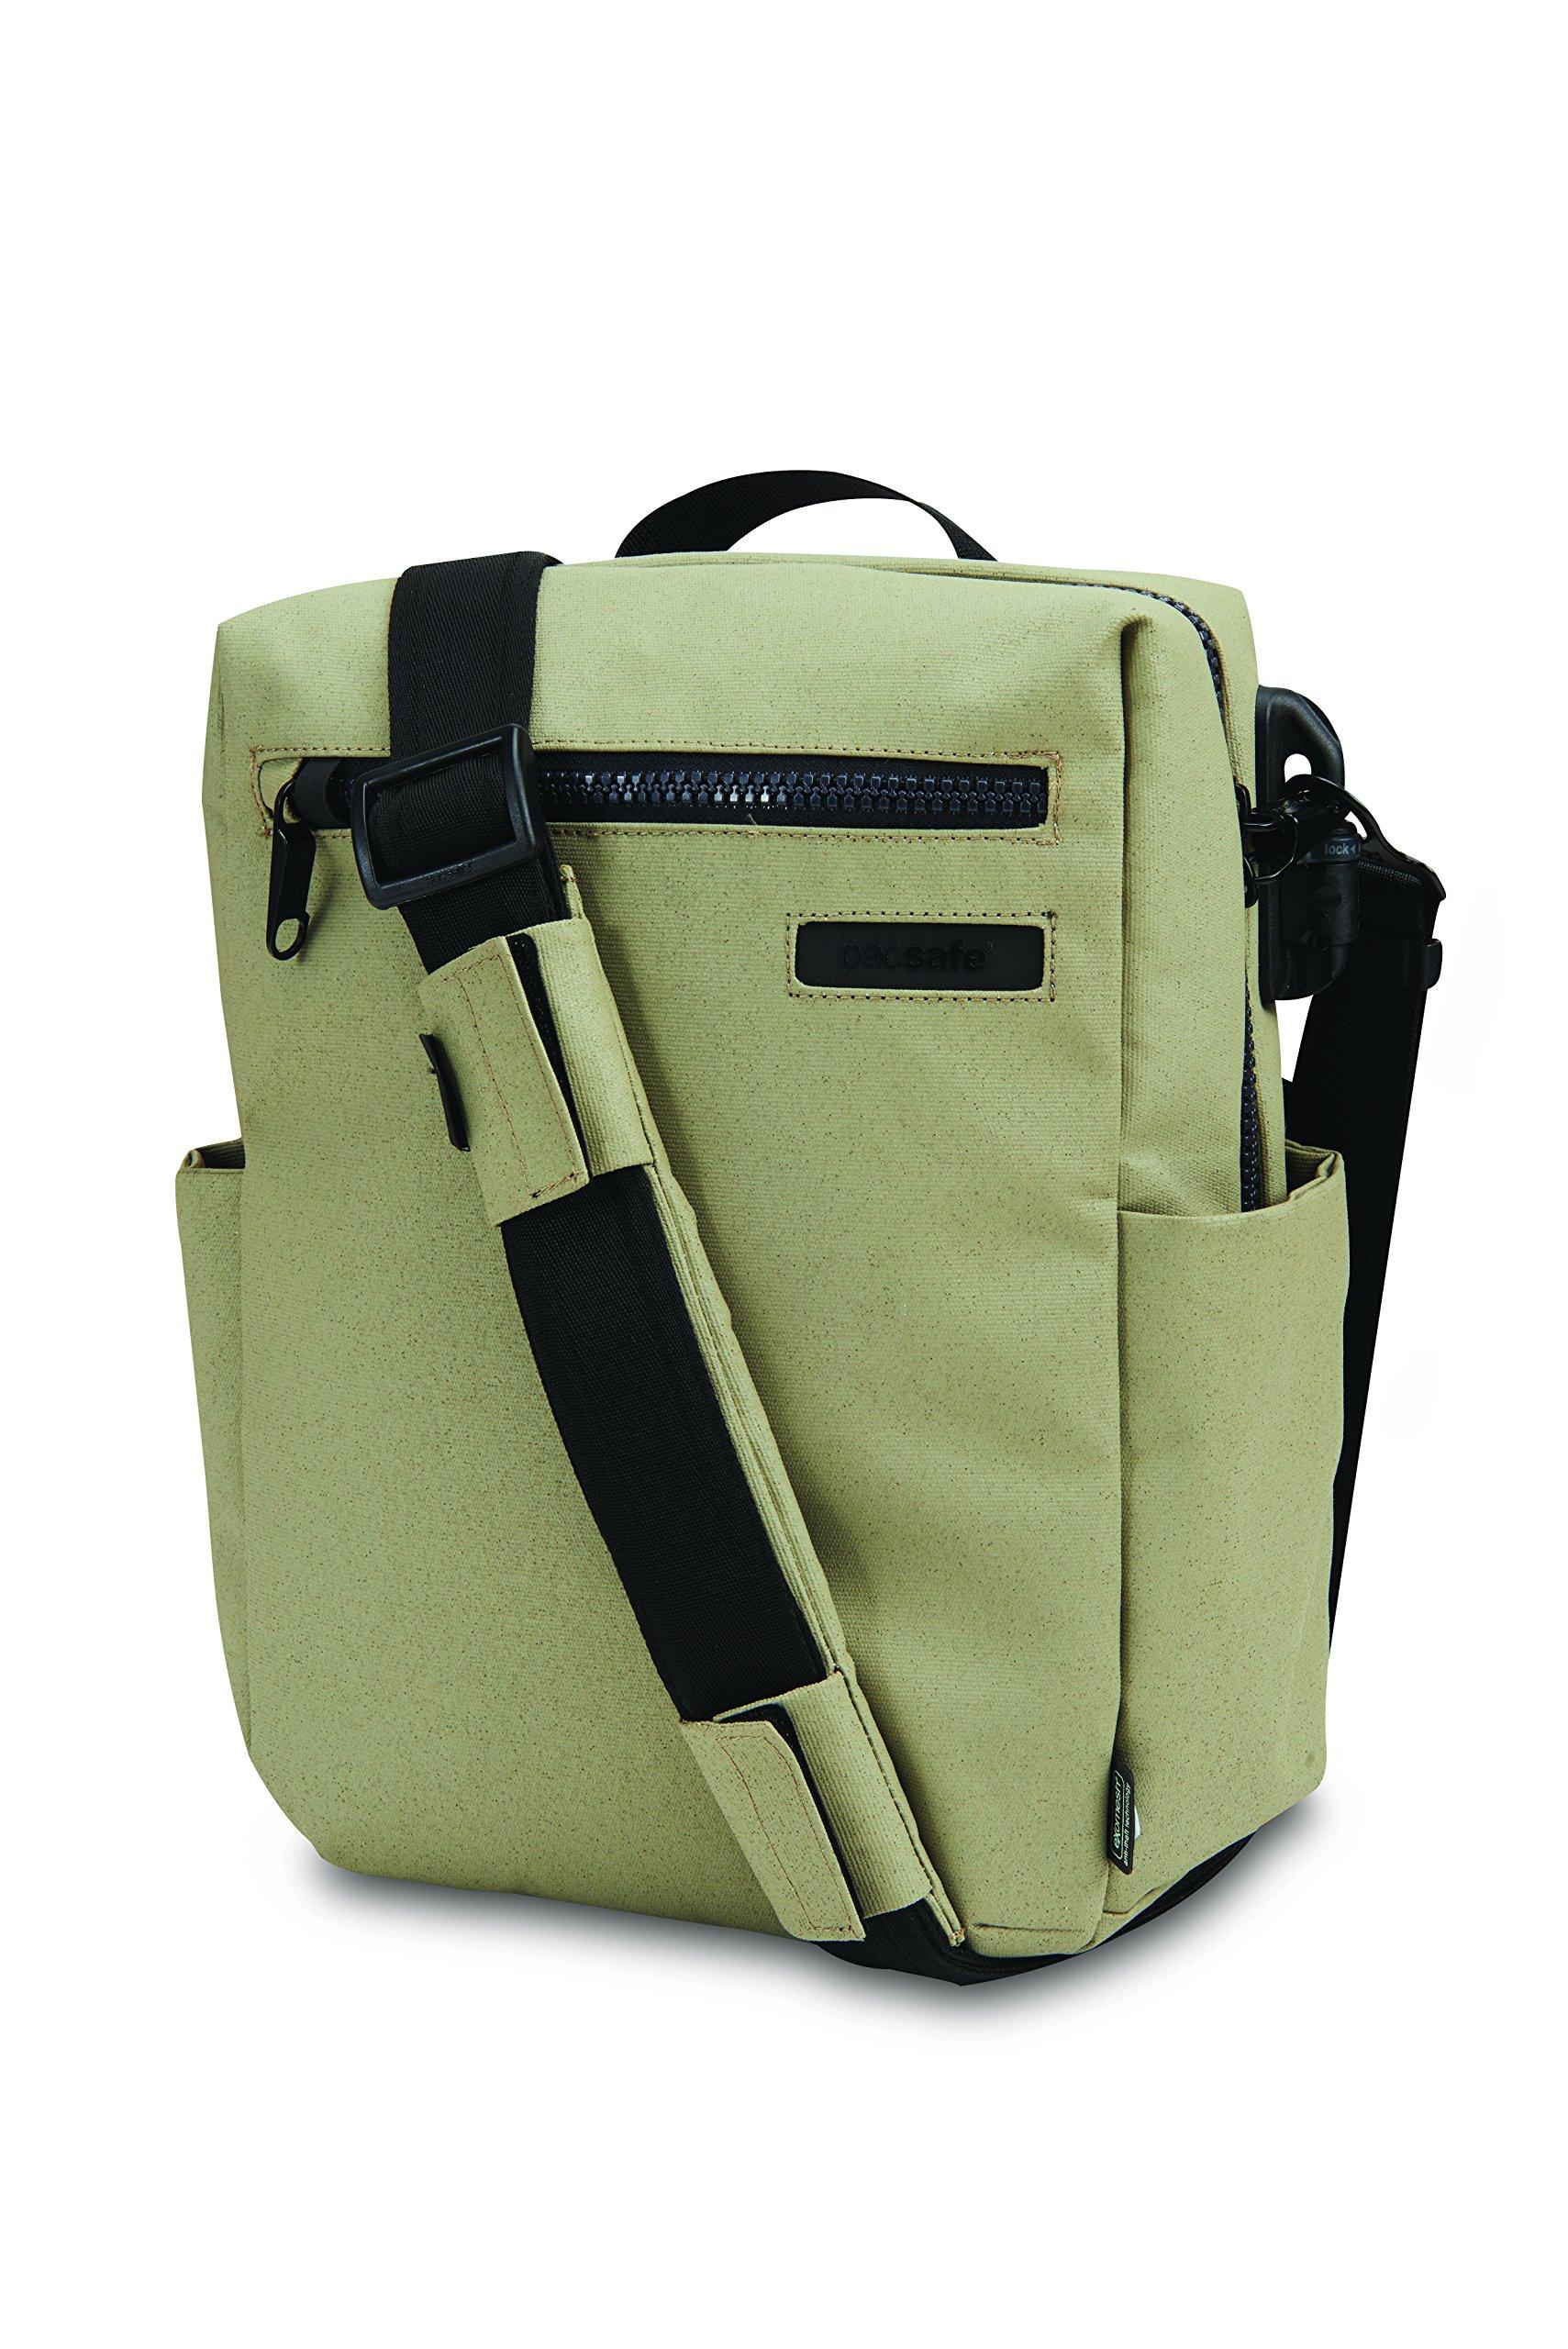 Pacsafe Intasafe Z250 Anti-Theft Travel Bag, Slate Green